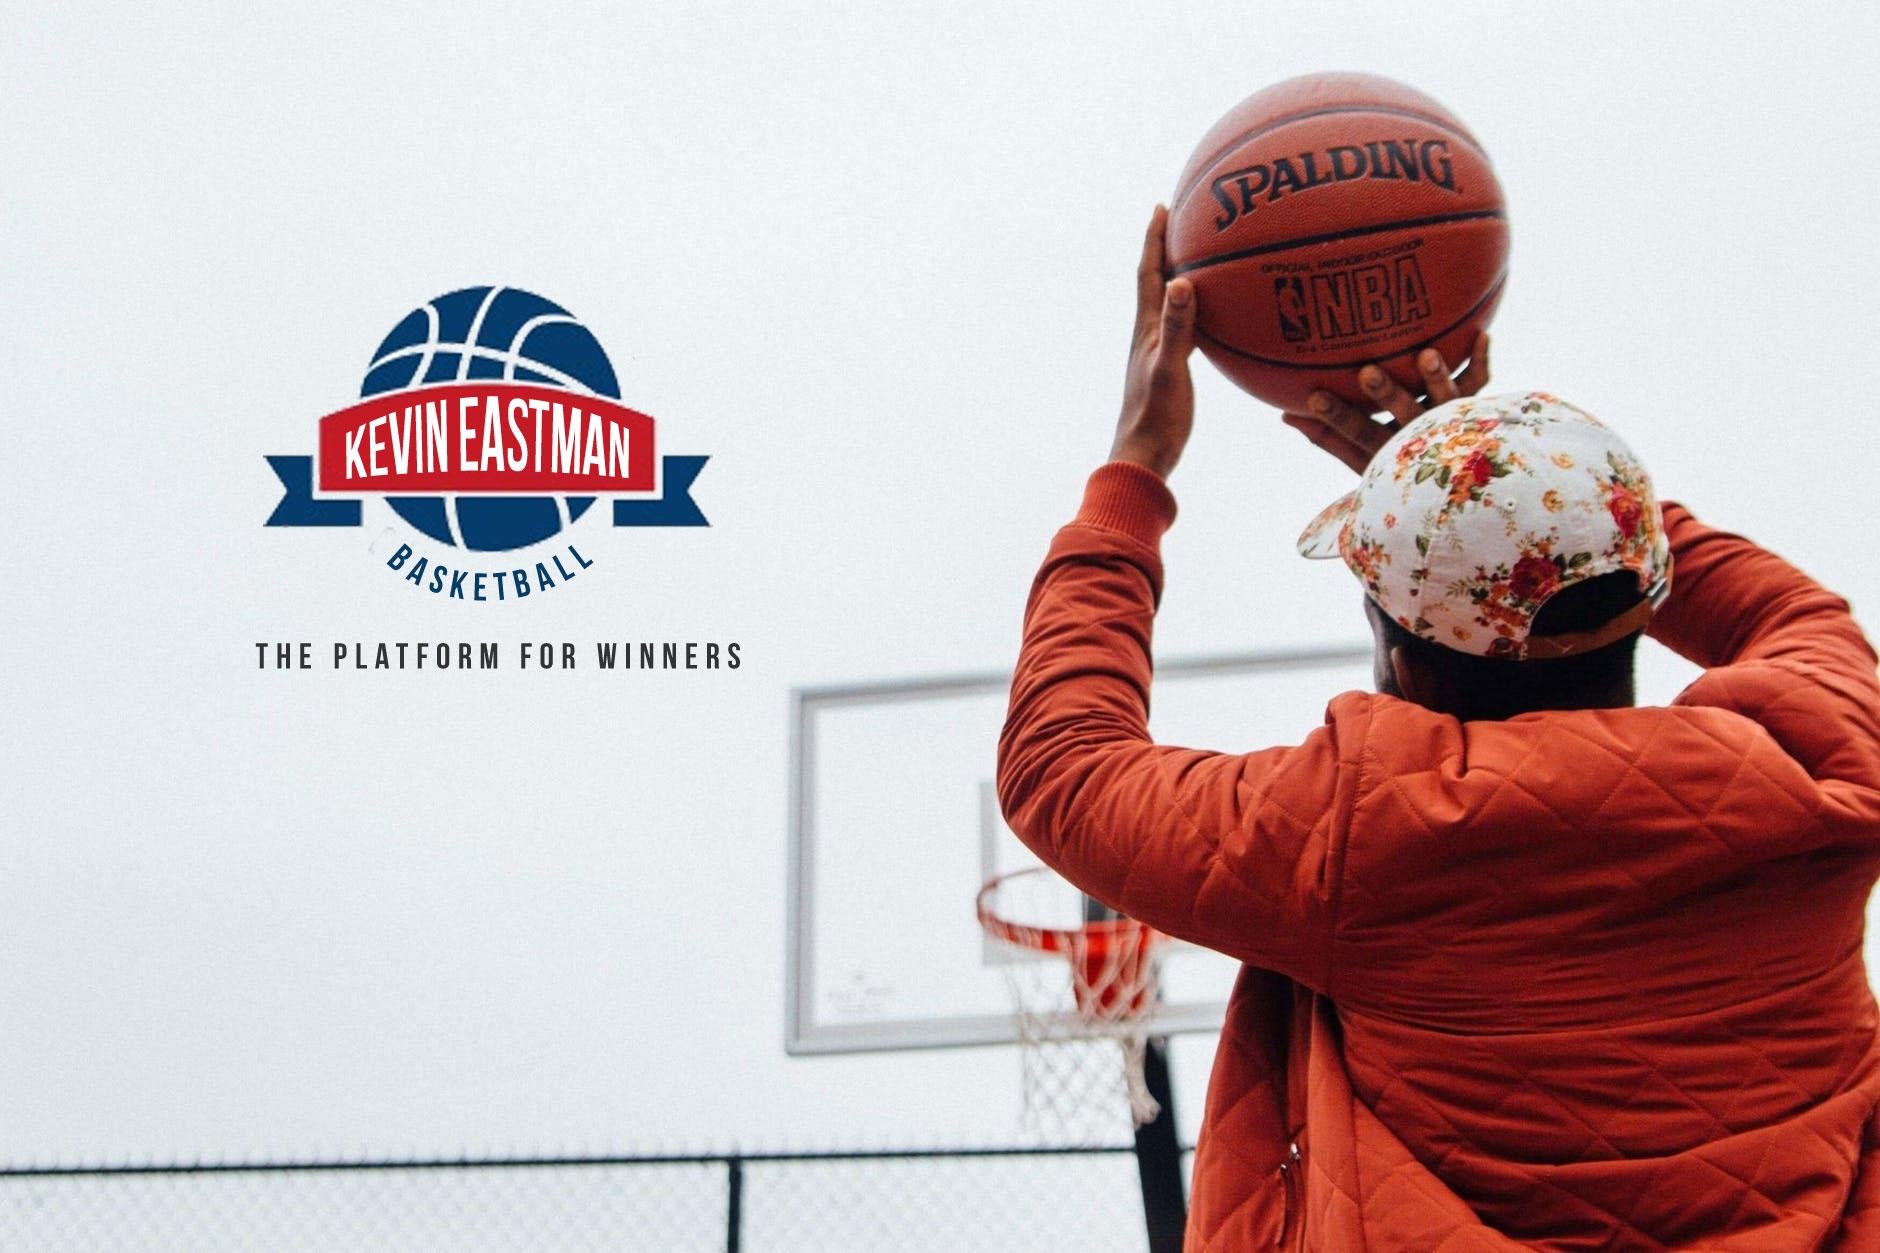 Kevin Eastman Basketball (@kevineastman018) Cover Image